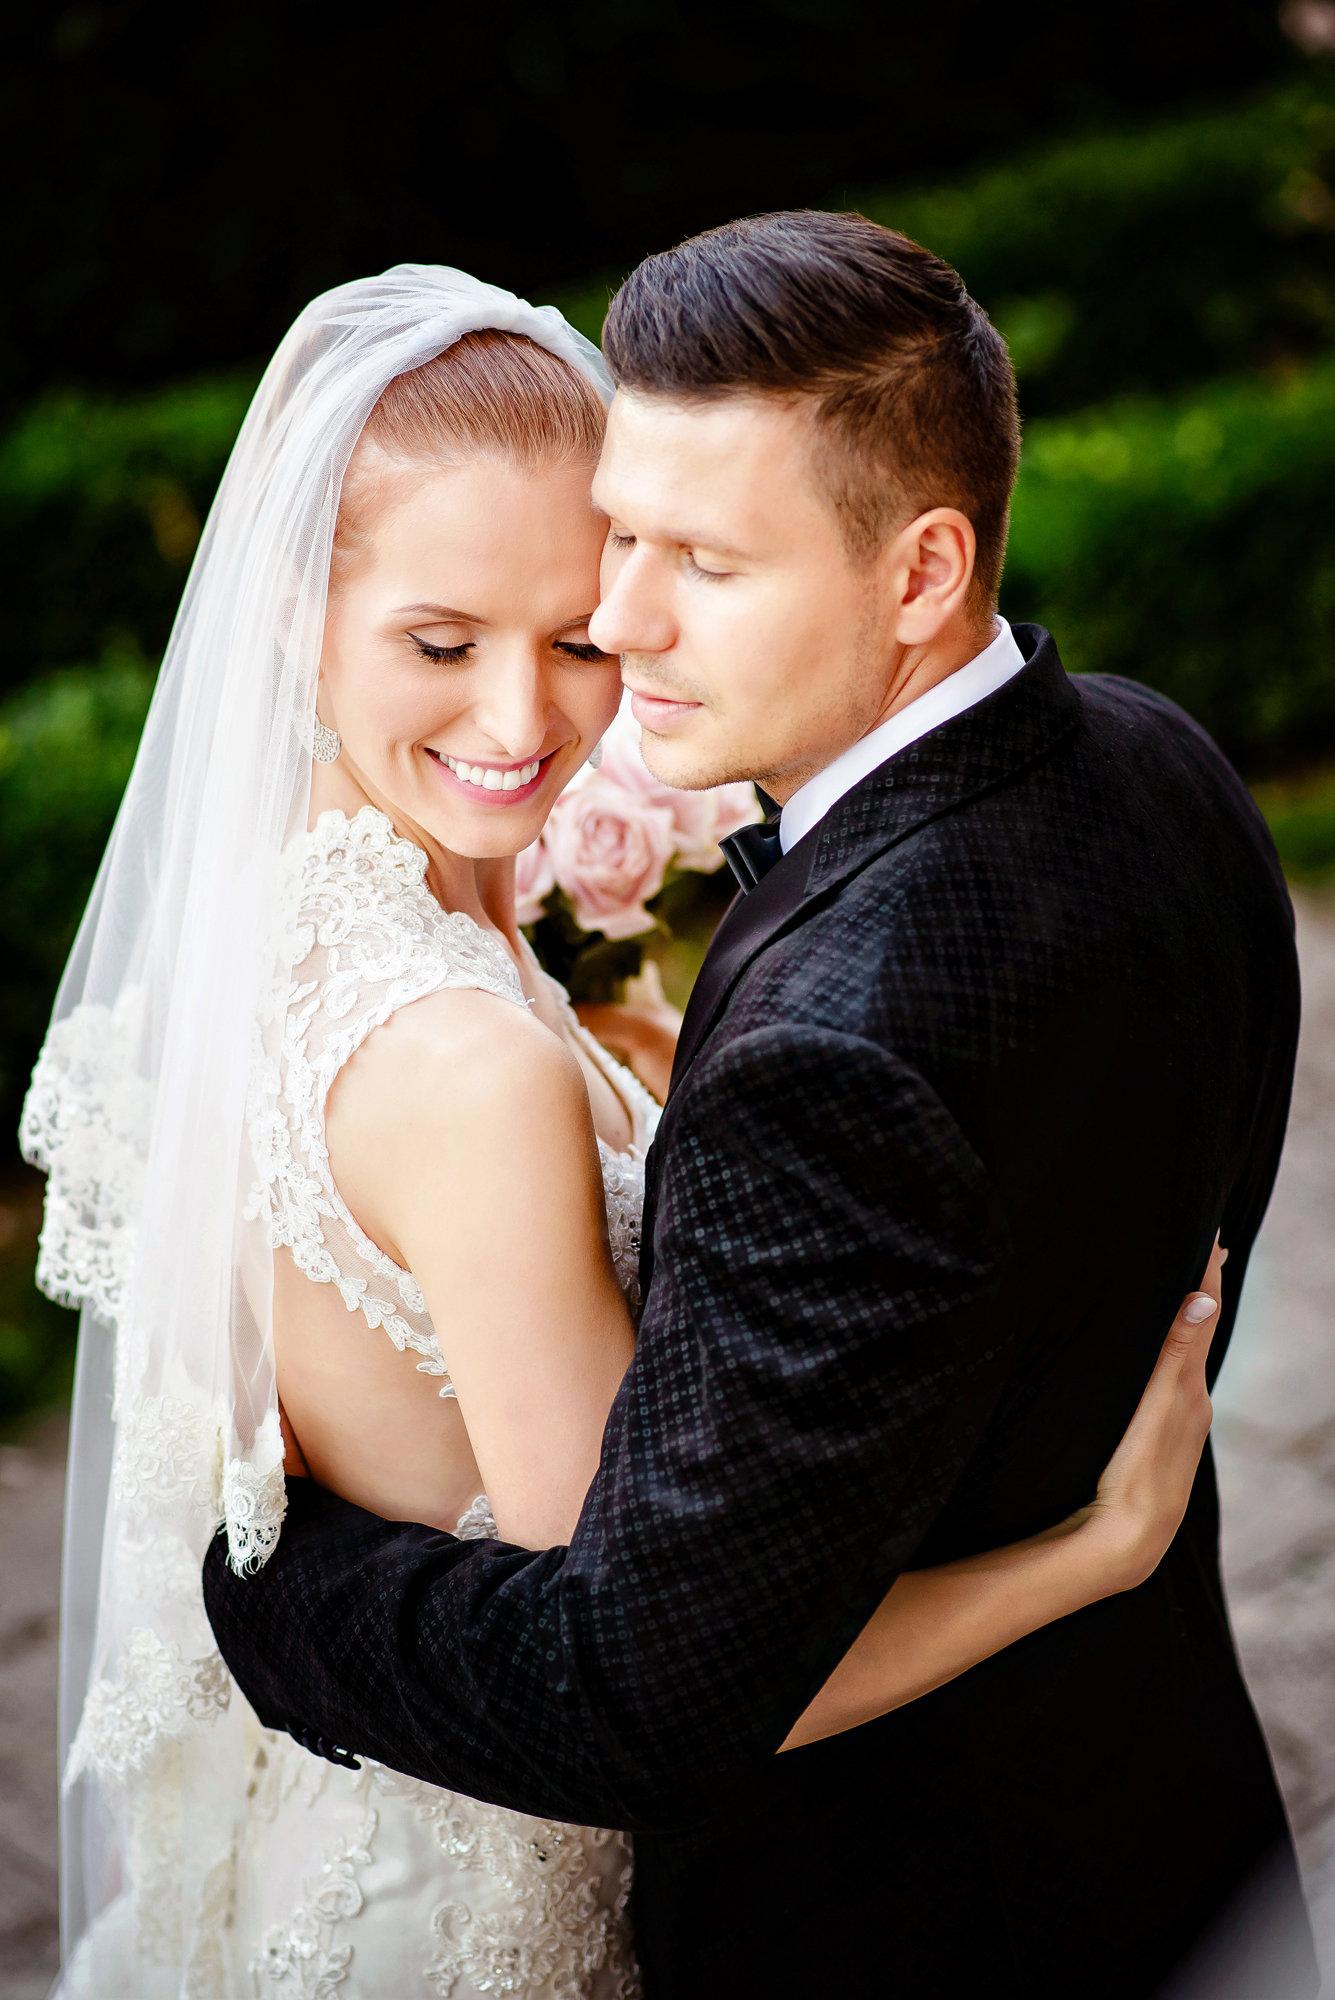 alexandru madalina wedding day 32